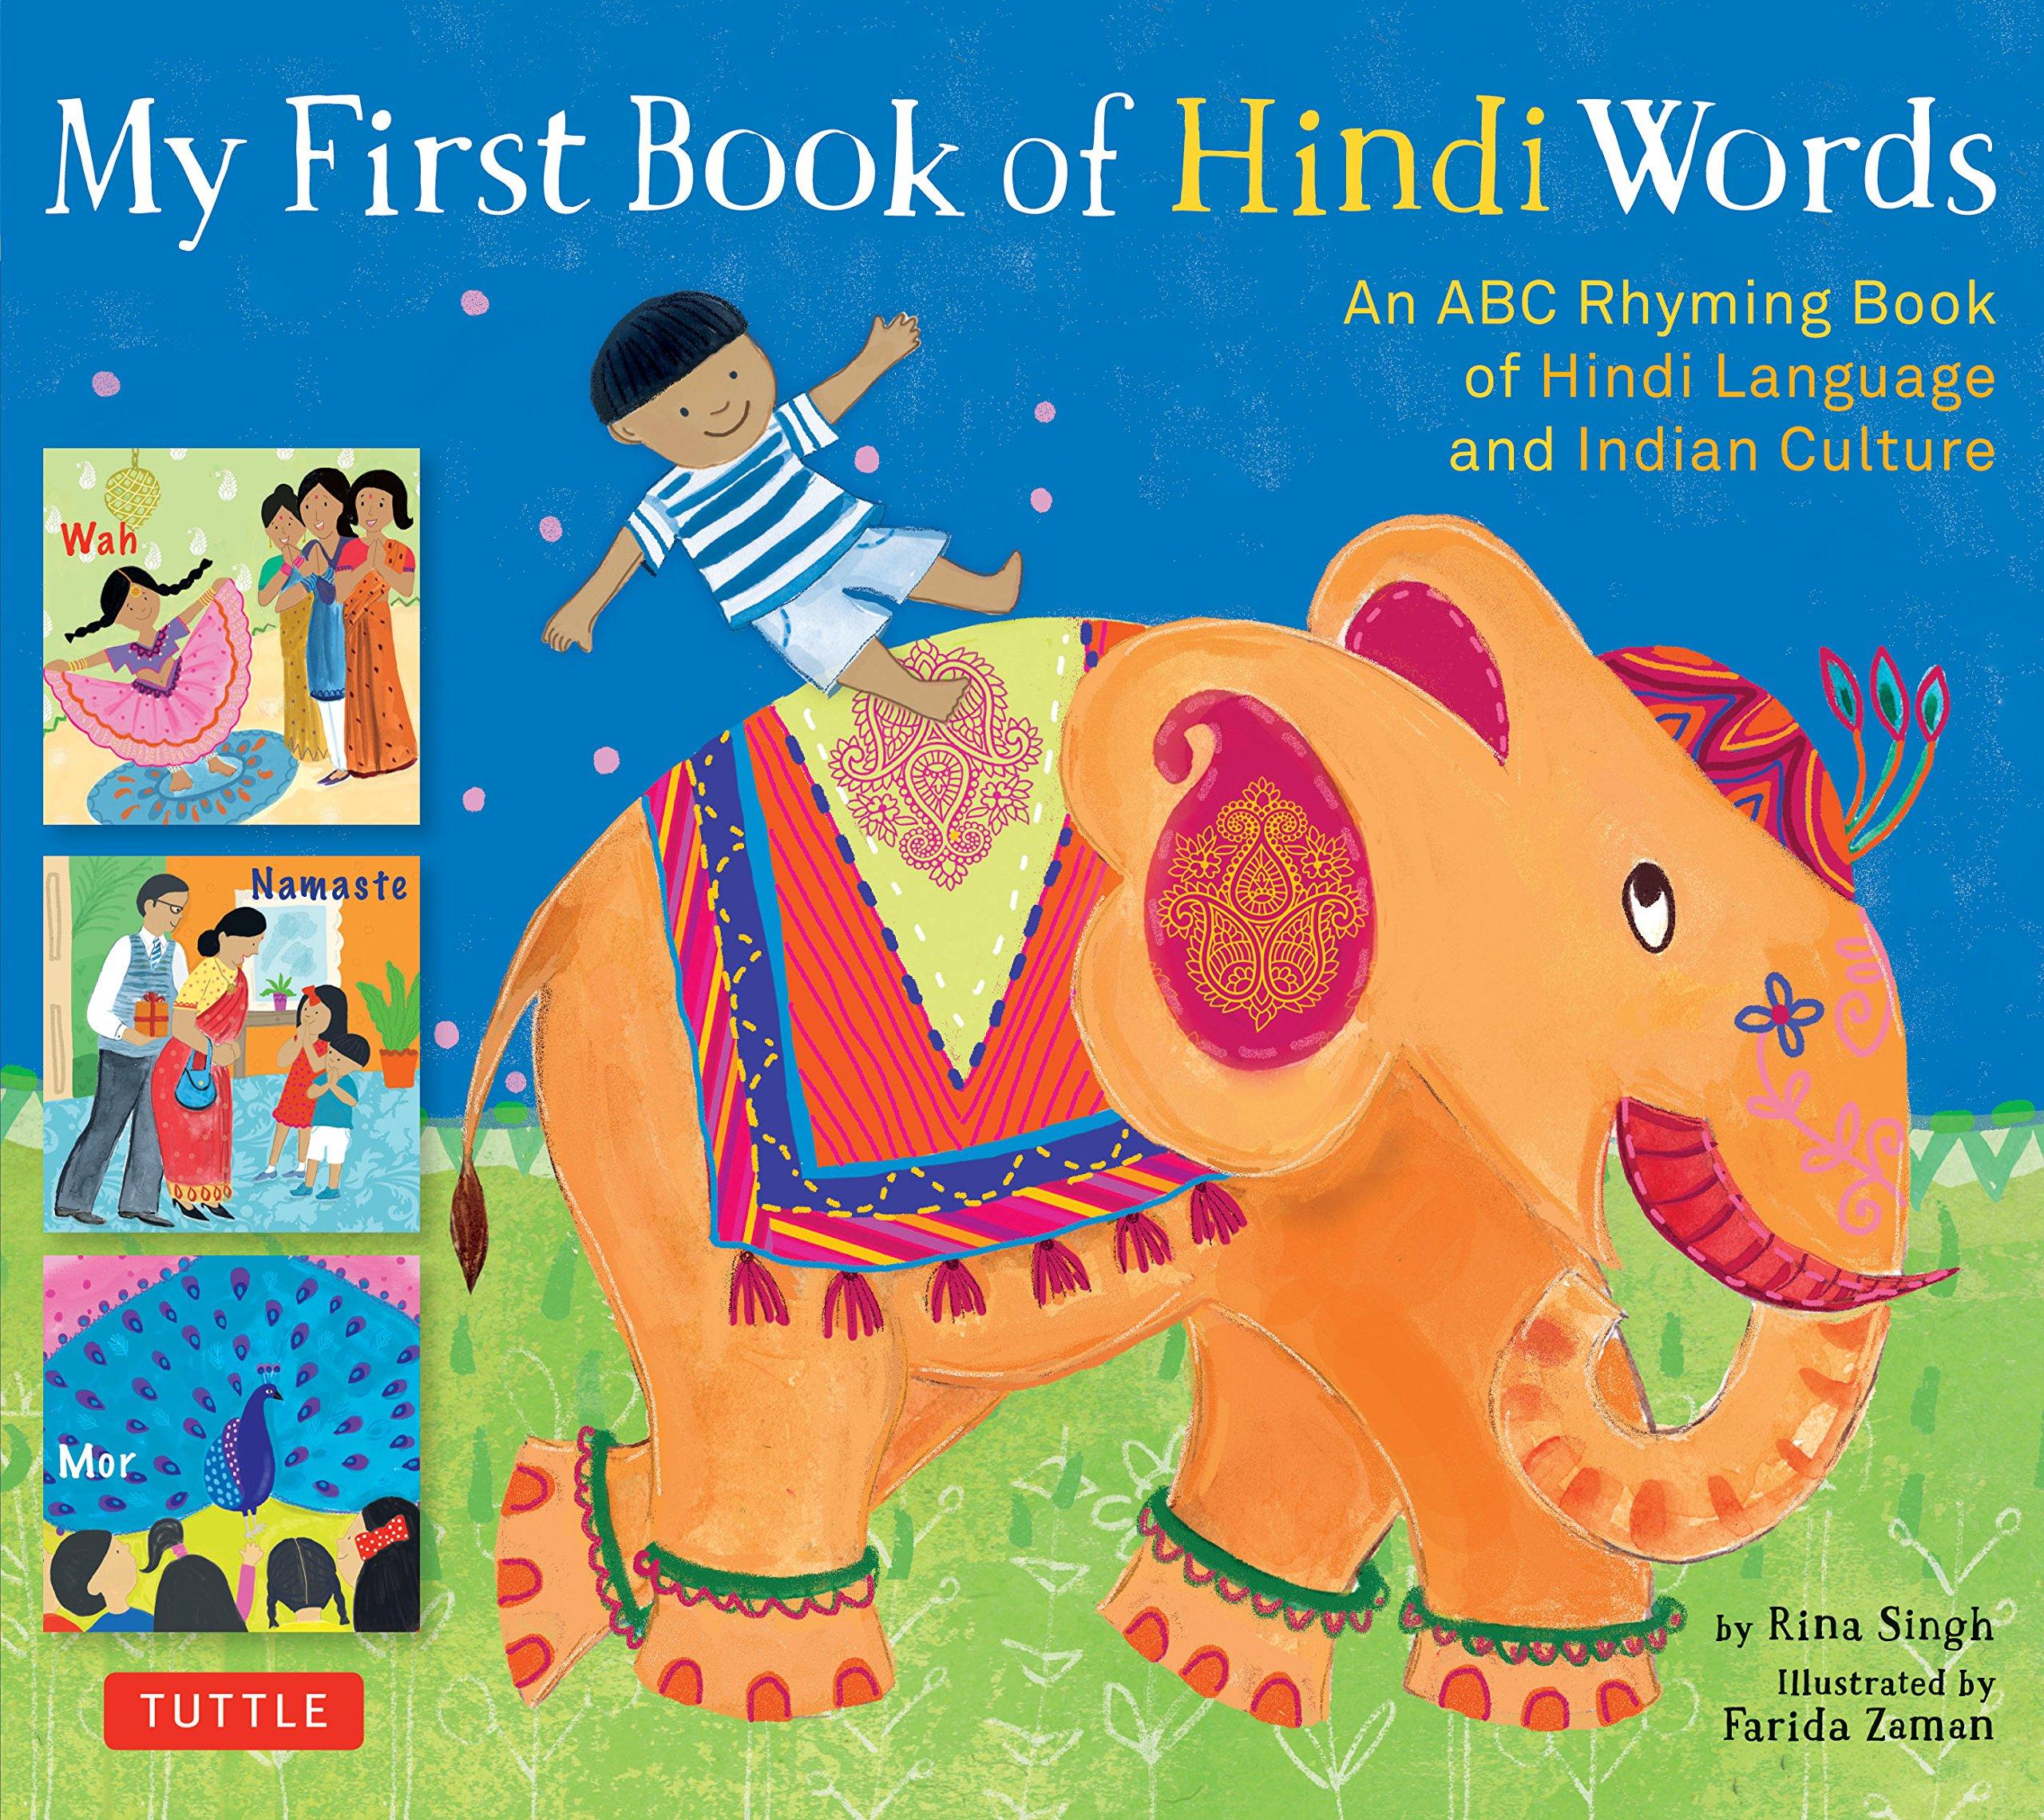 My First Book of Hindi Words: An ABC Rhyming Book of Hindi